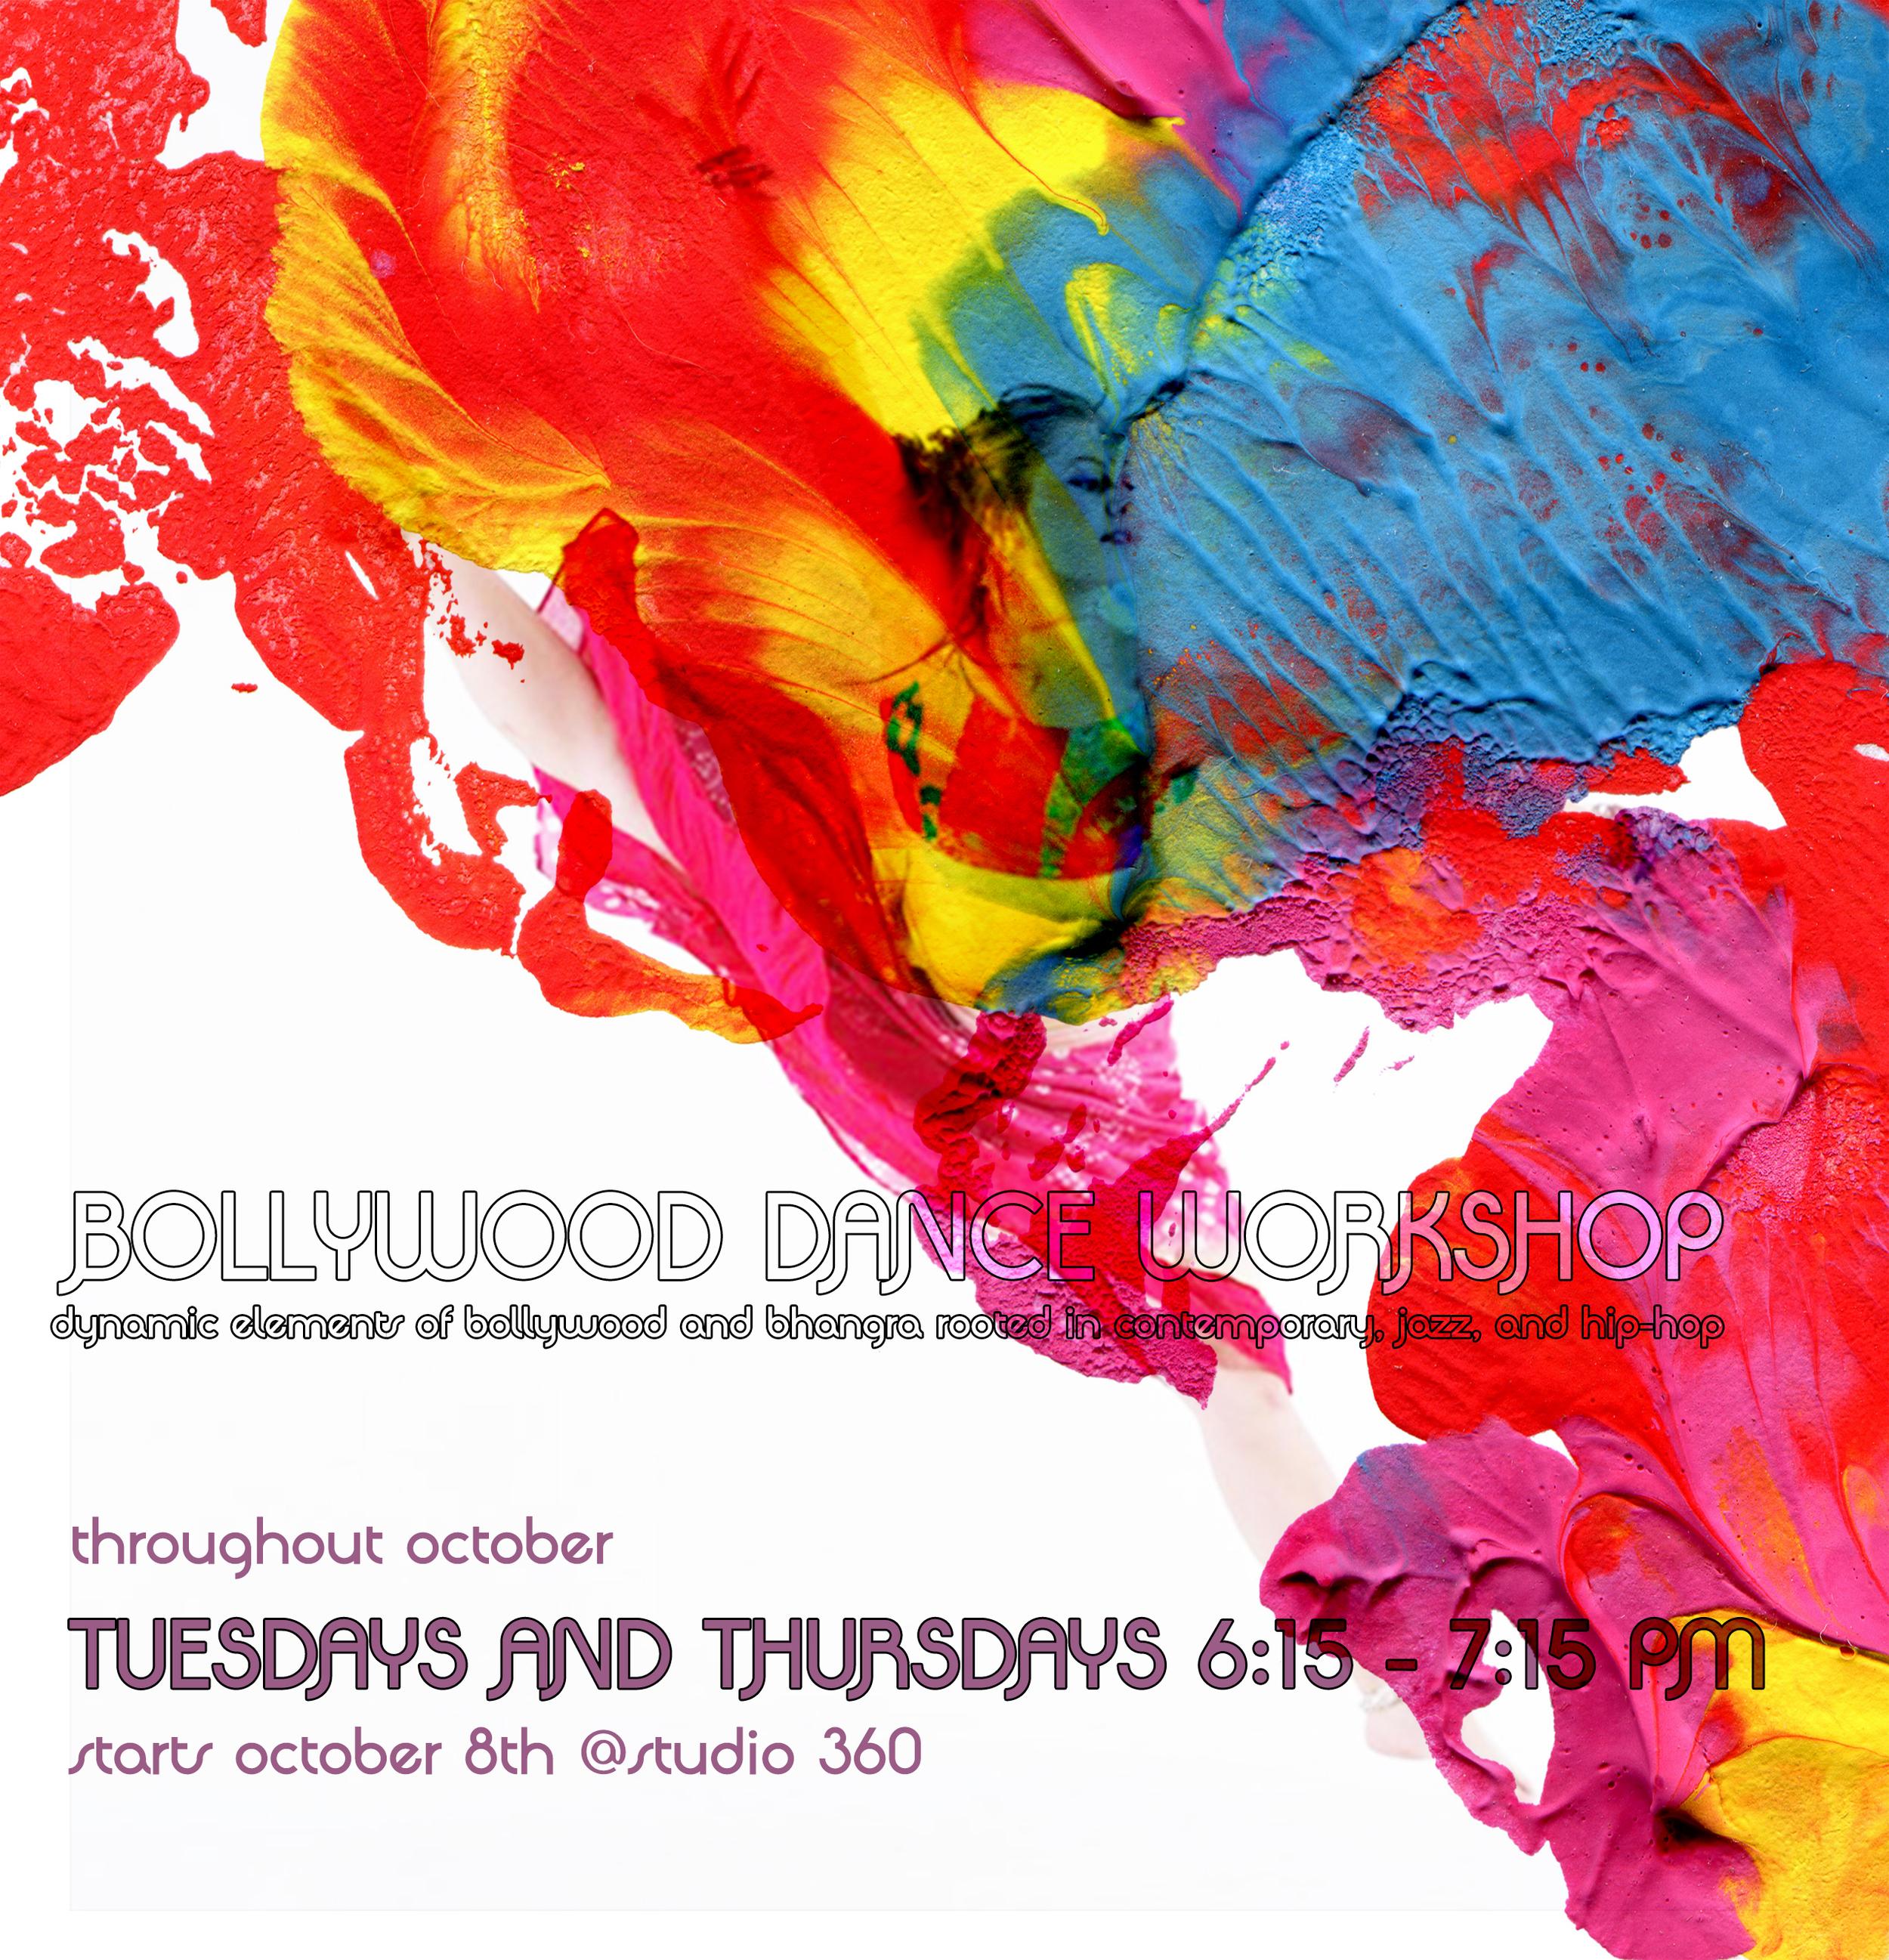 Bollywood-Workshop-for-Blog.jpg